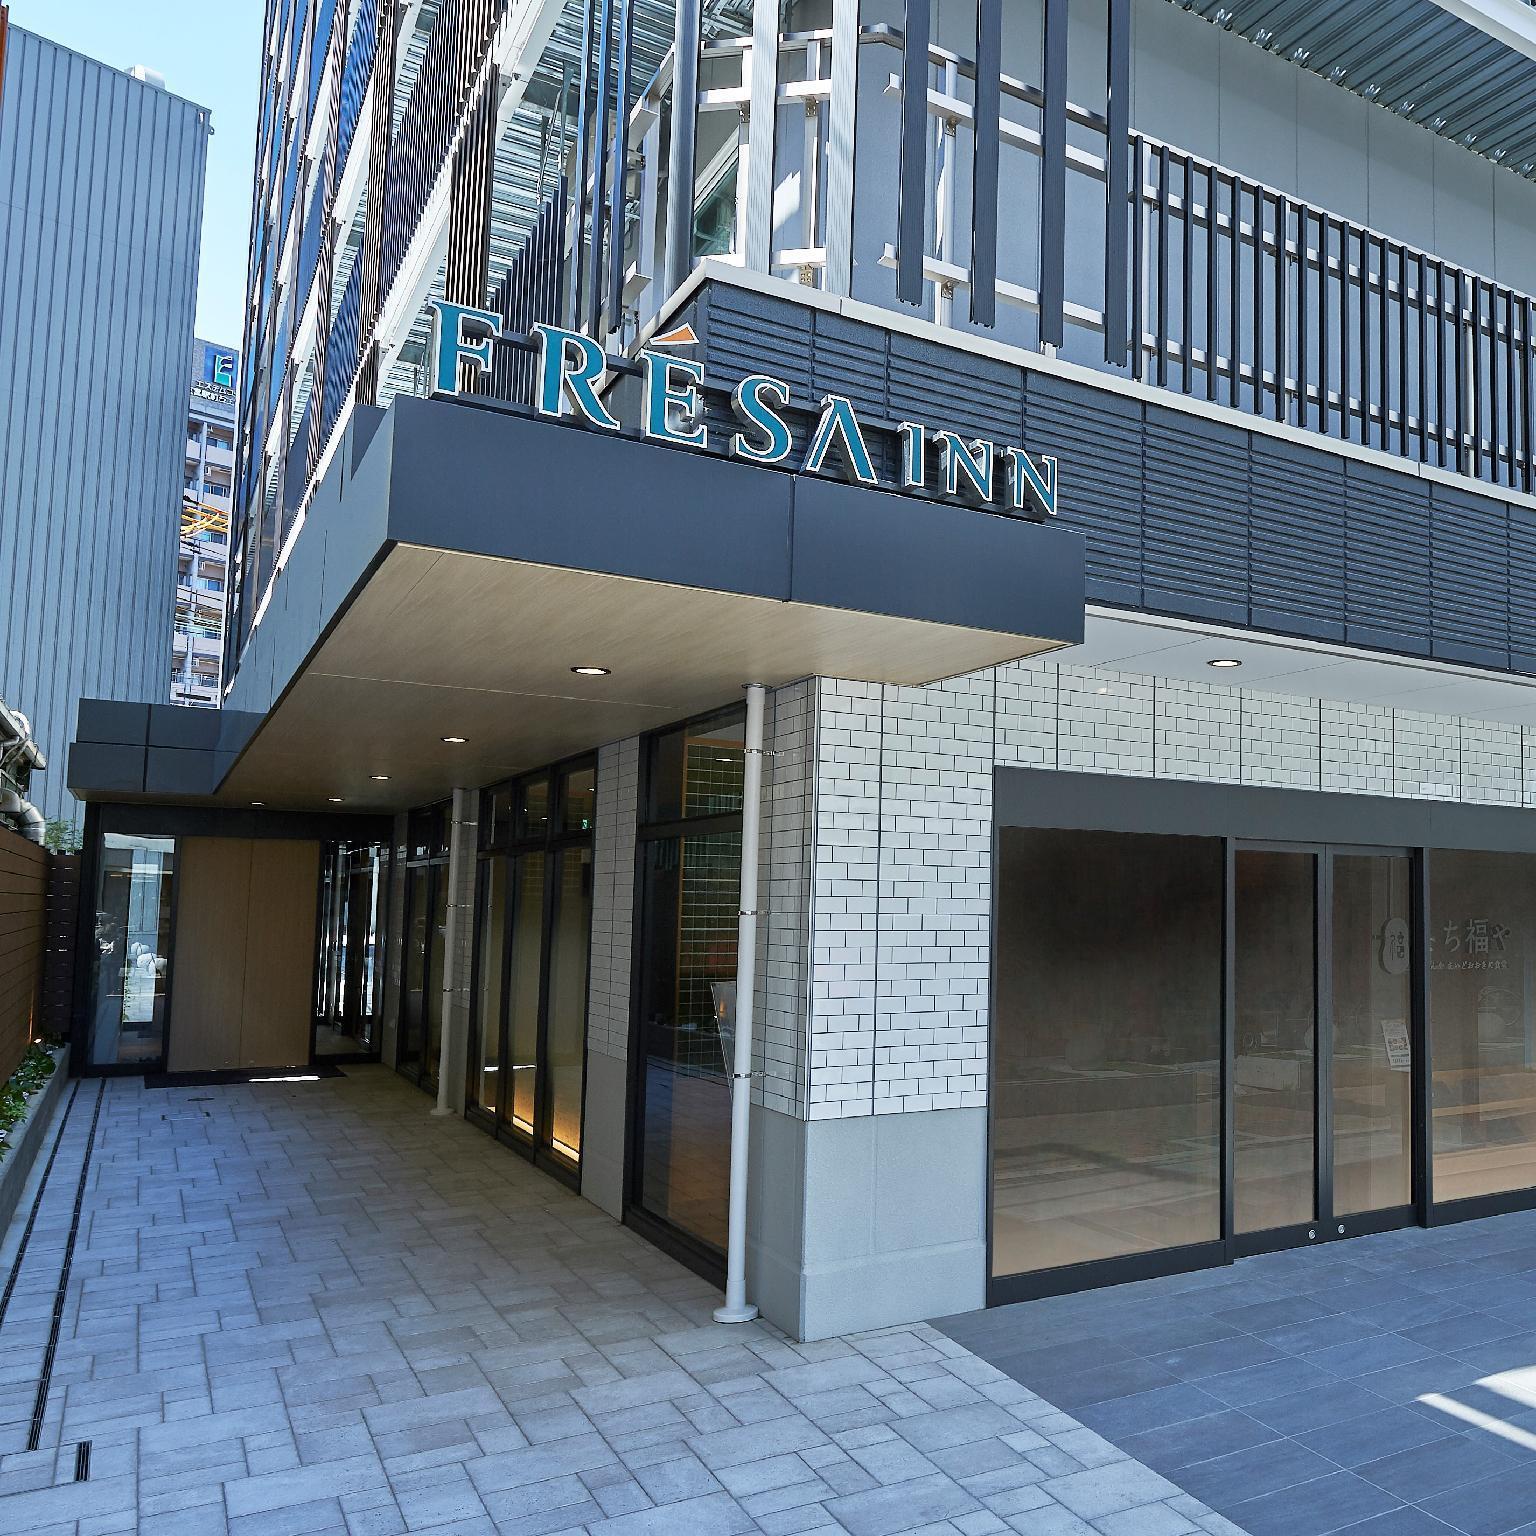 Sotetsu Fresa Inn Kobe-Sannomiya